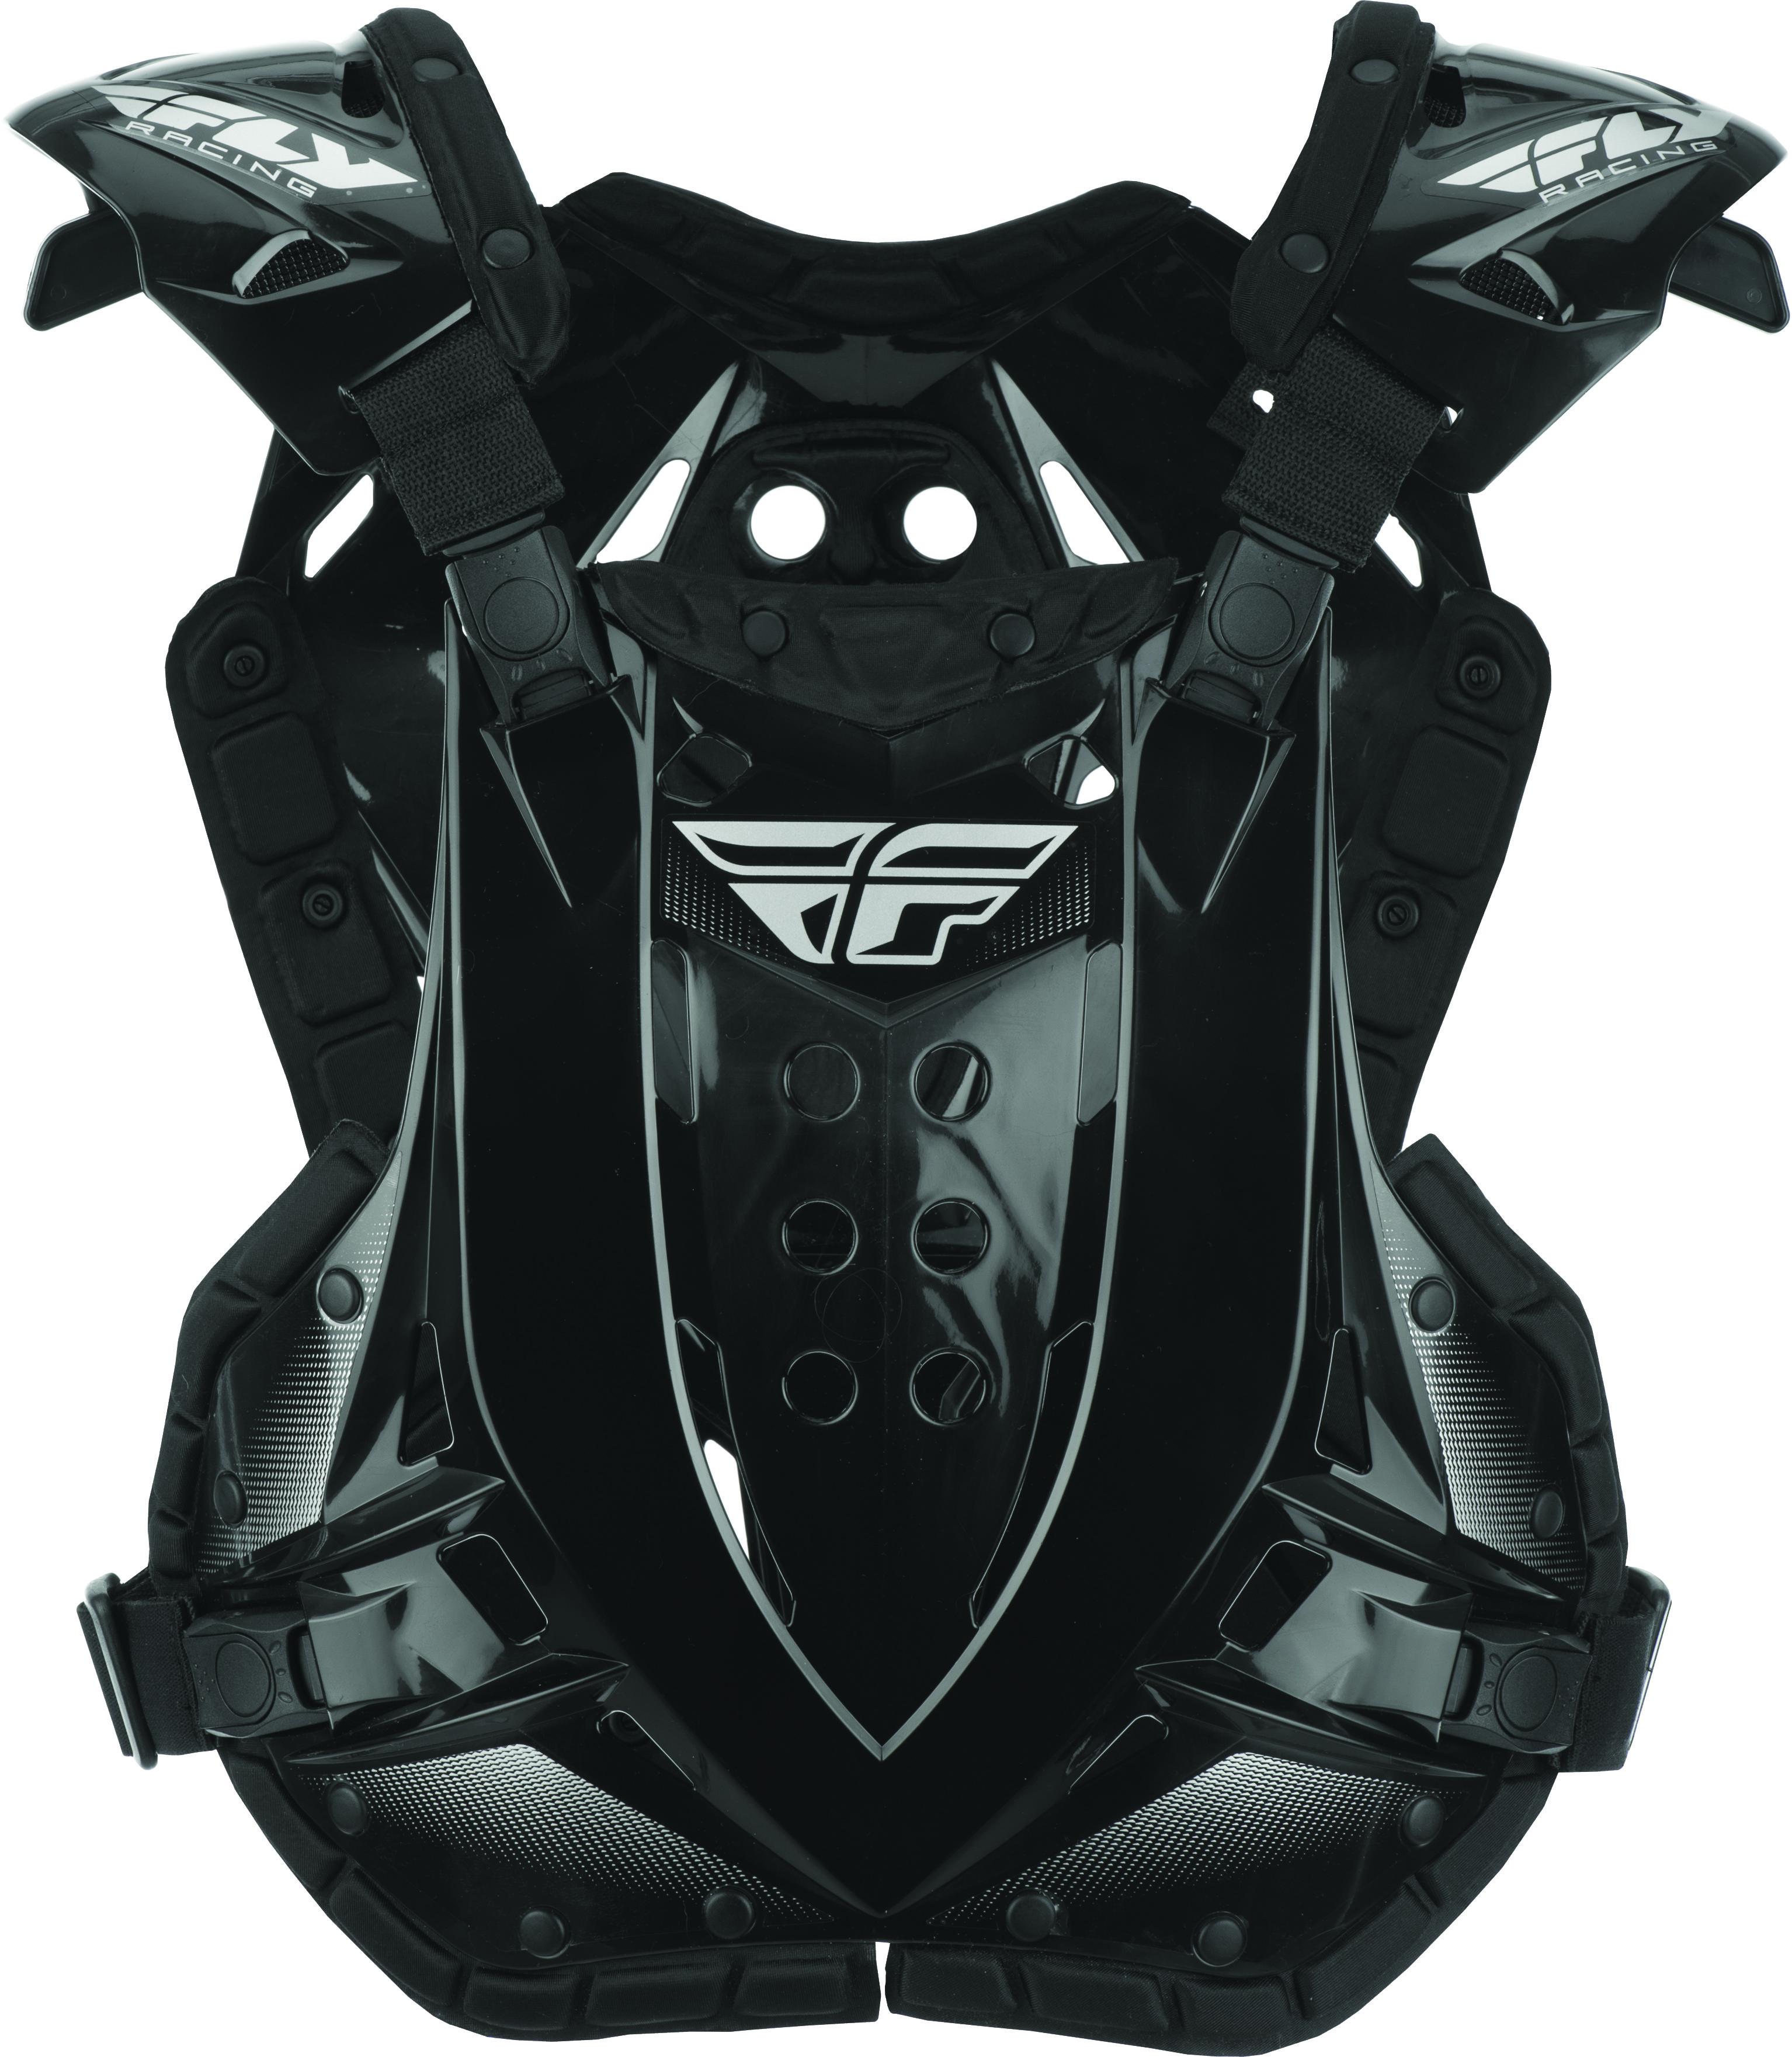 Stingray Roost Guard (Black)